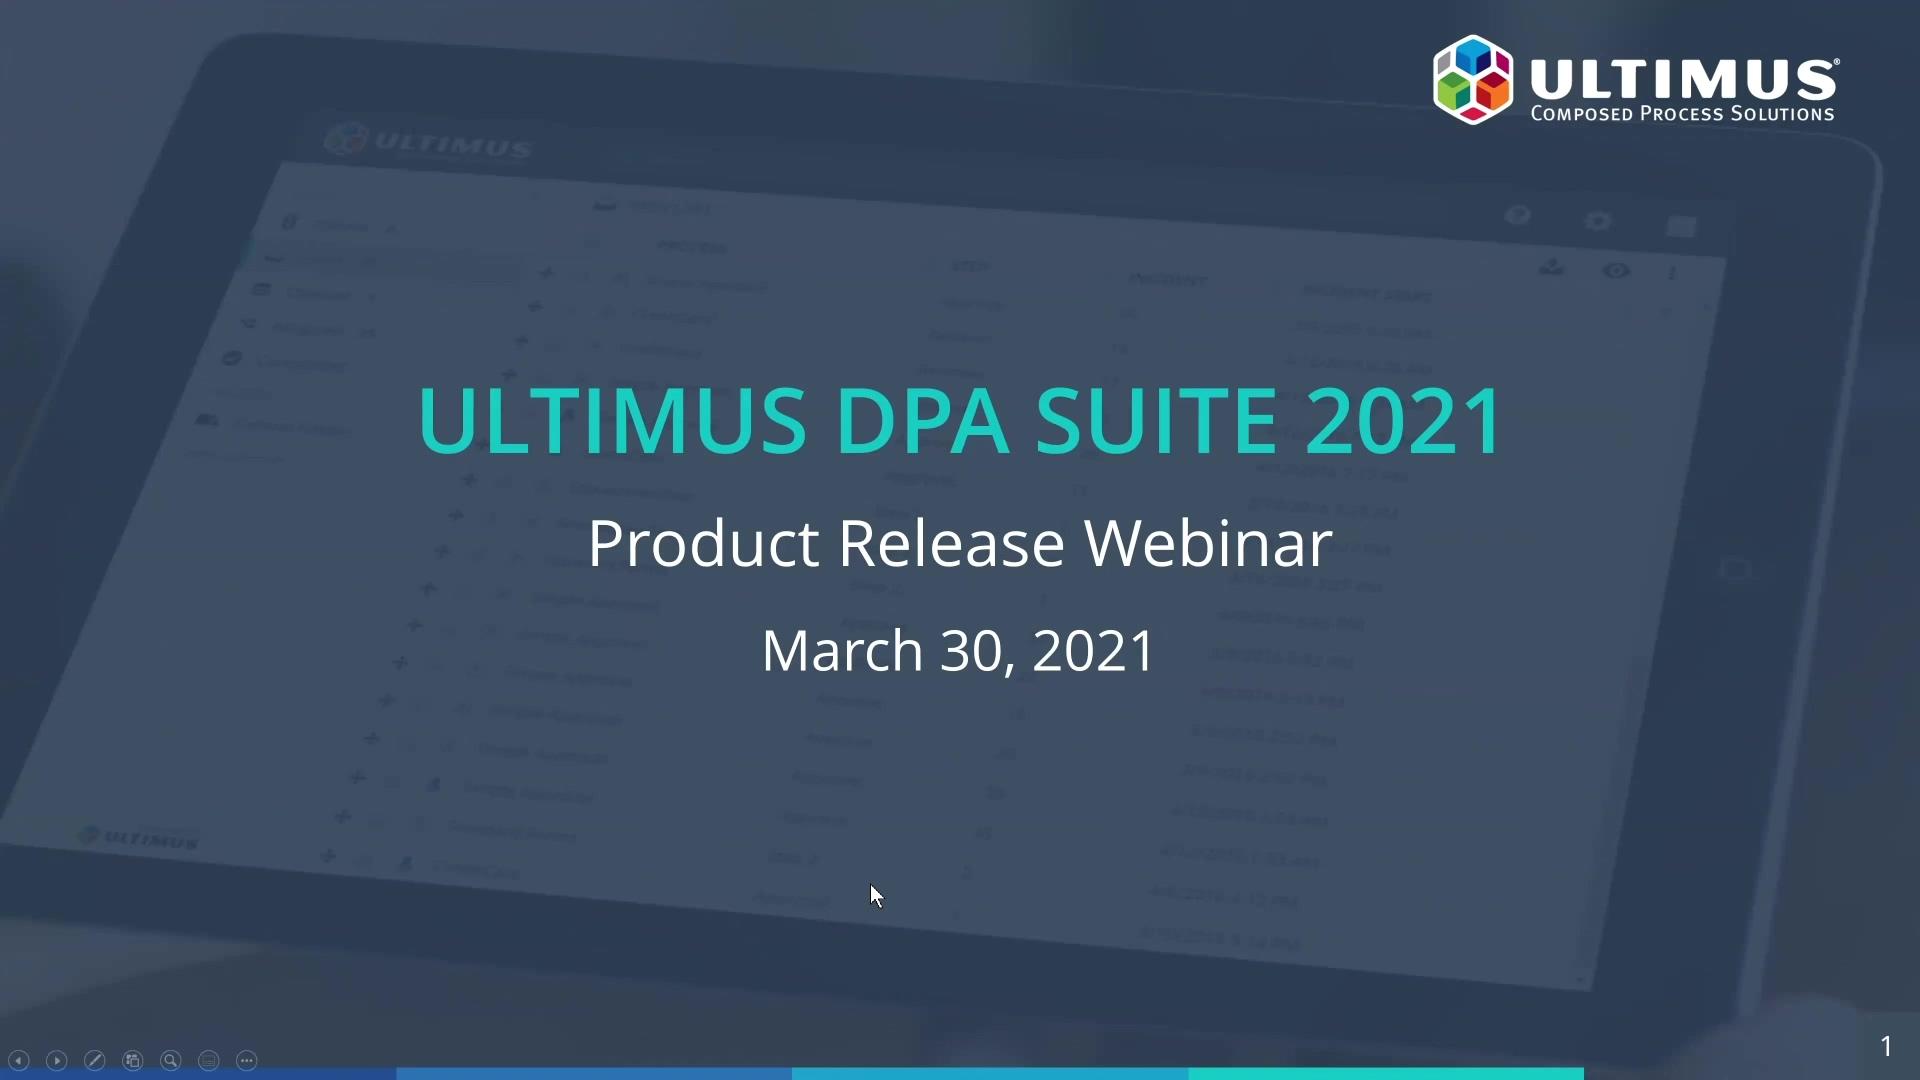 Ultimus DPA Suite 2021 Product Release Webinar